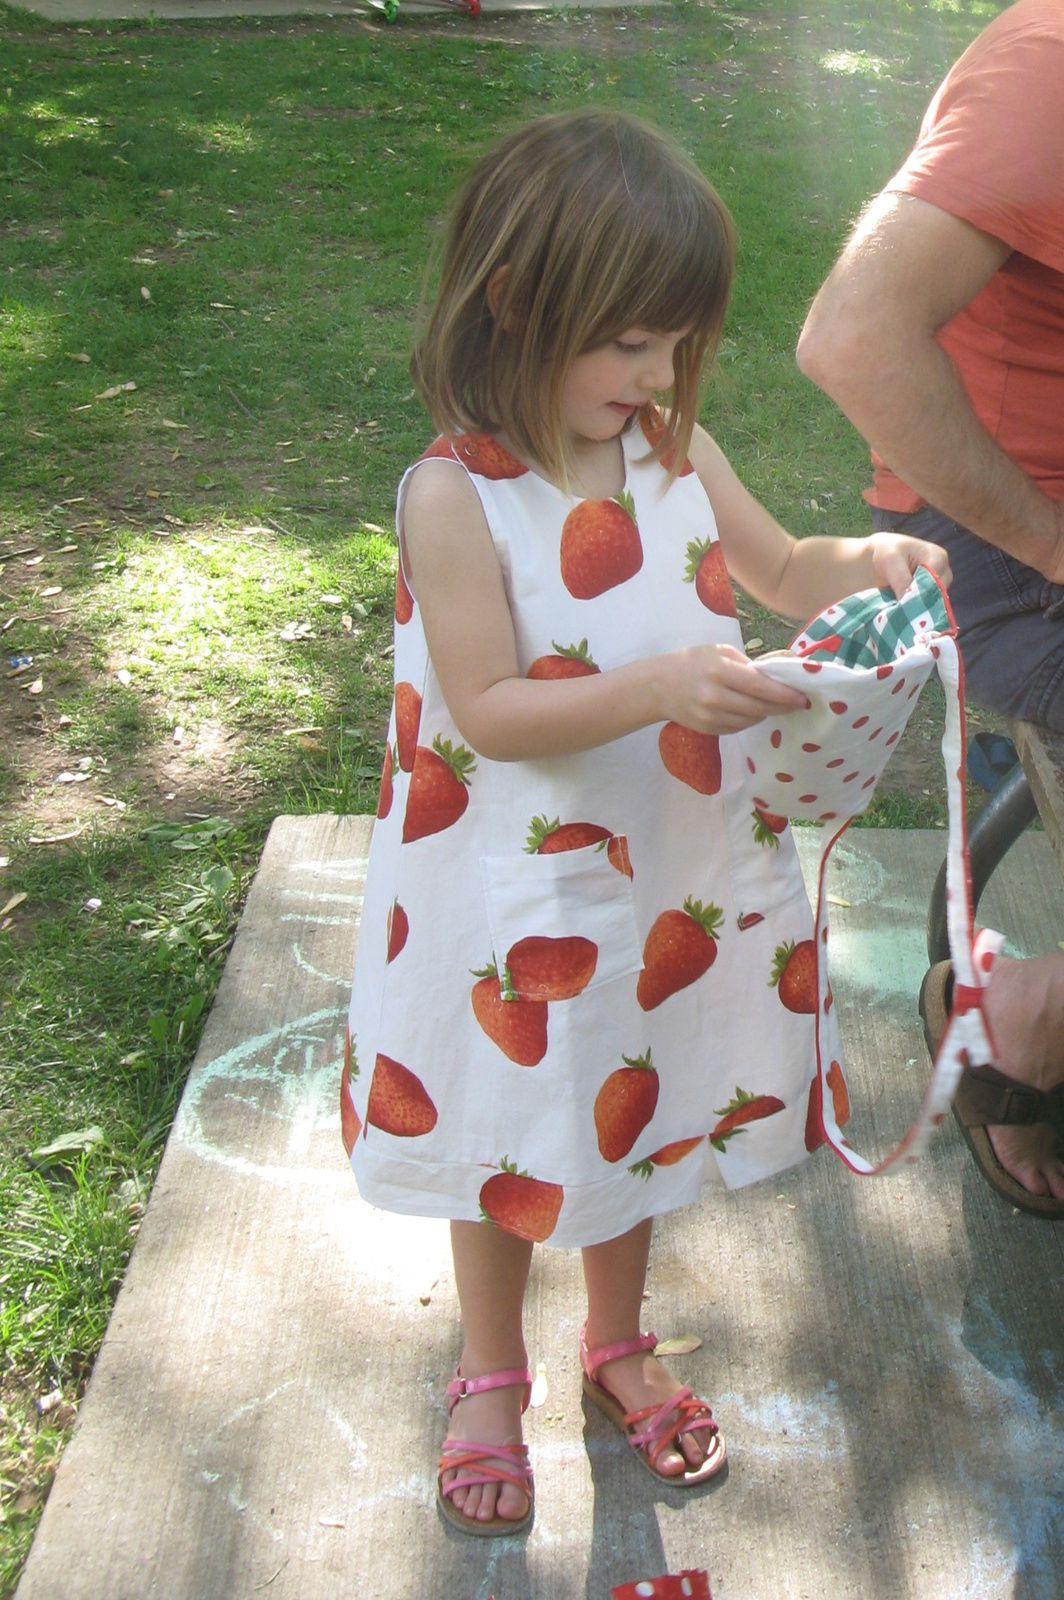 rose fraises pour petite fille + sac a main+ boite charlotteblabla